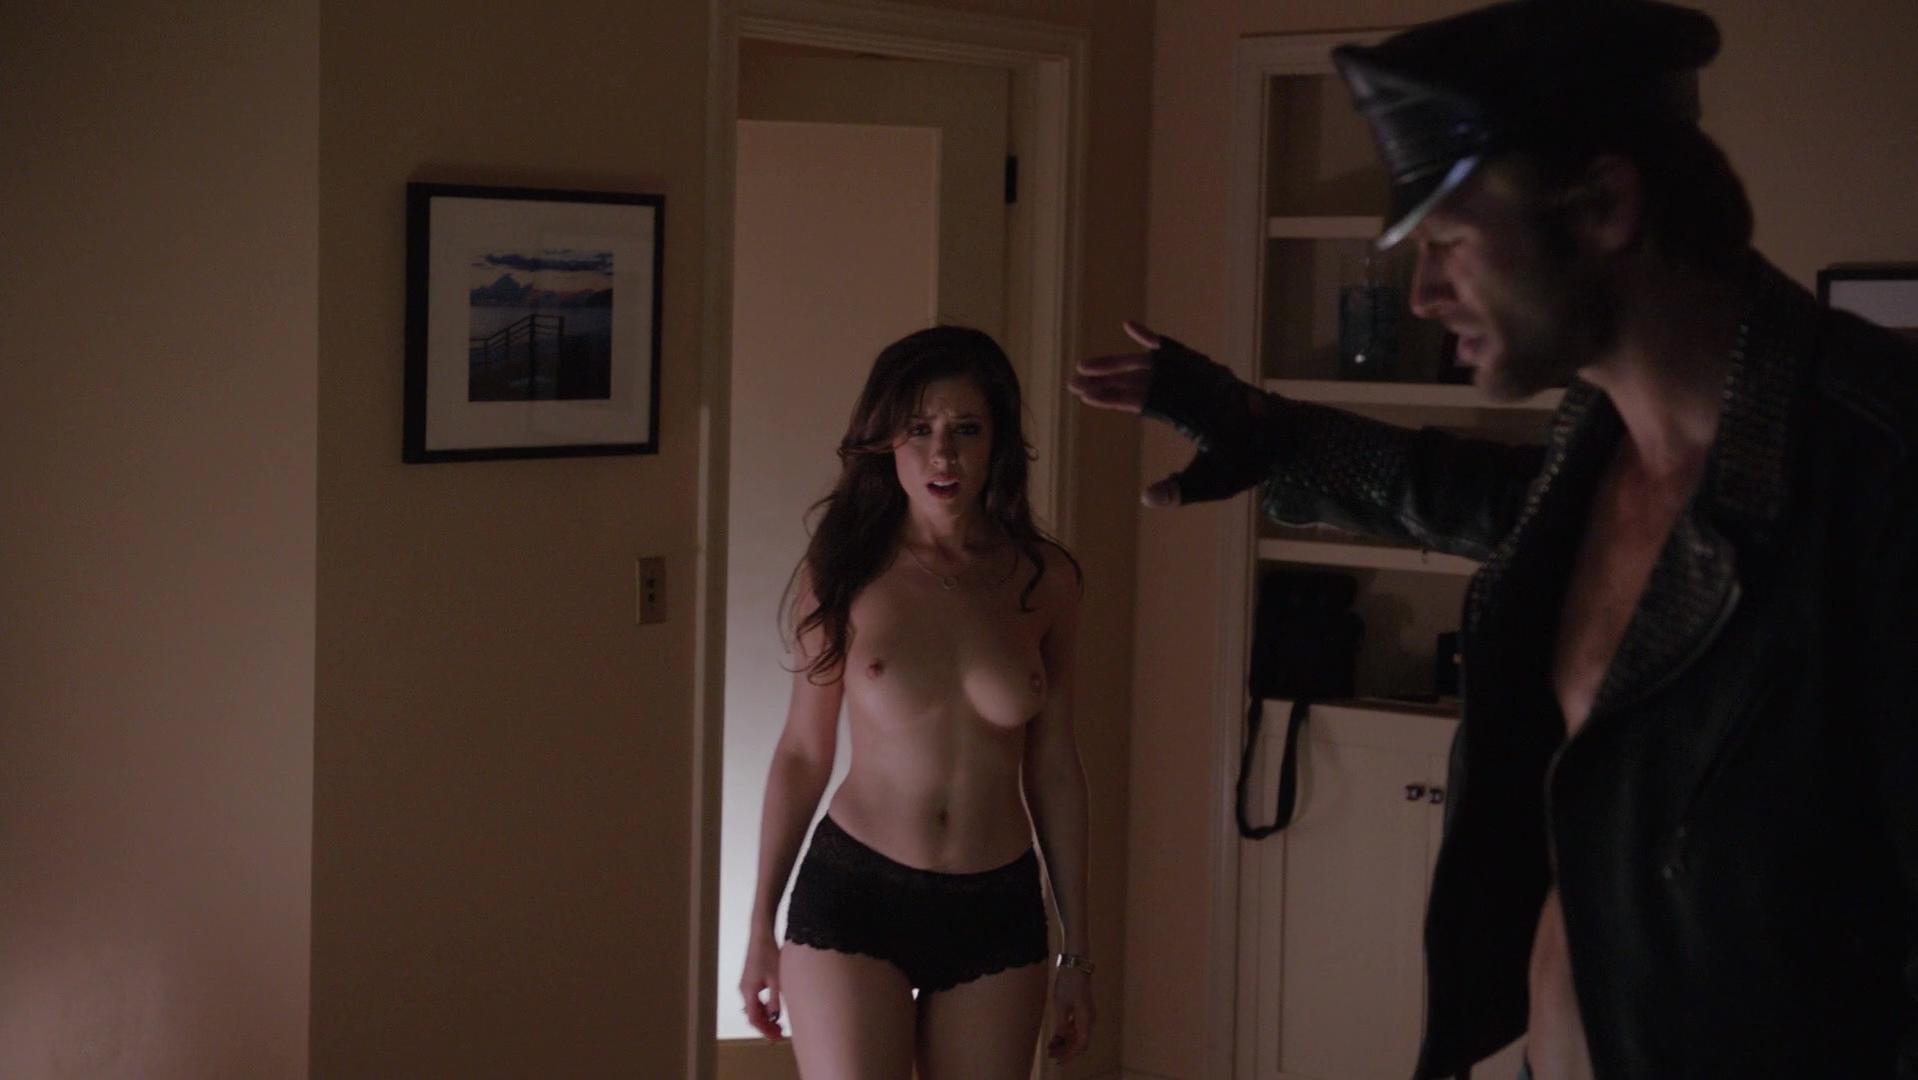 pics of mario characters naked